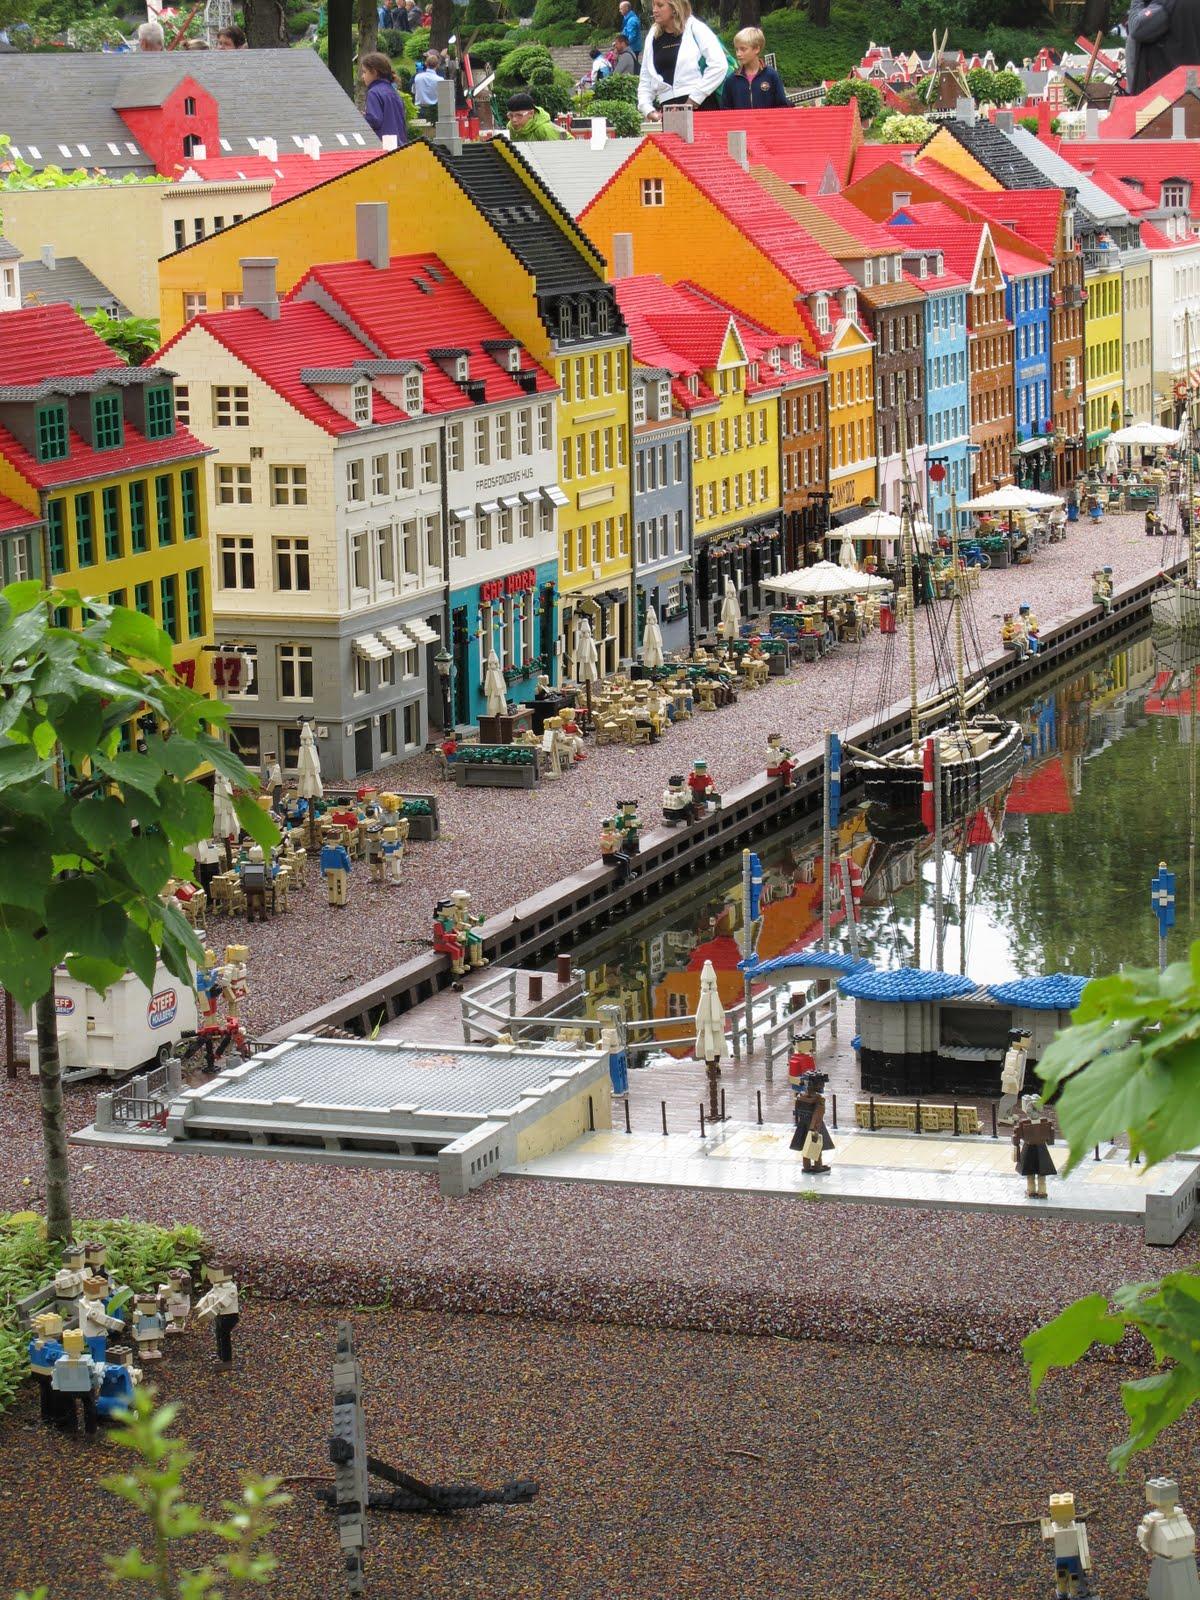 legoland billund   Denmark   Pinterest